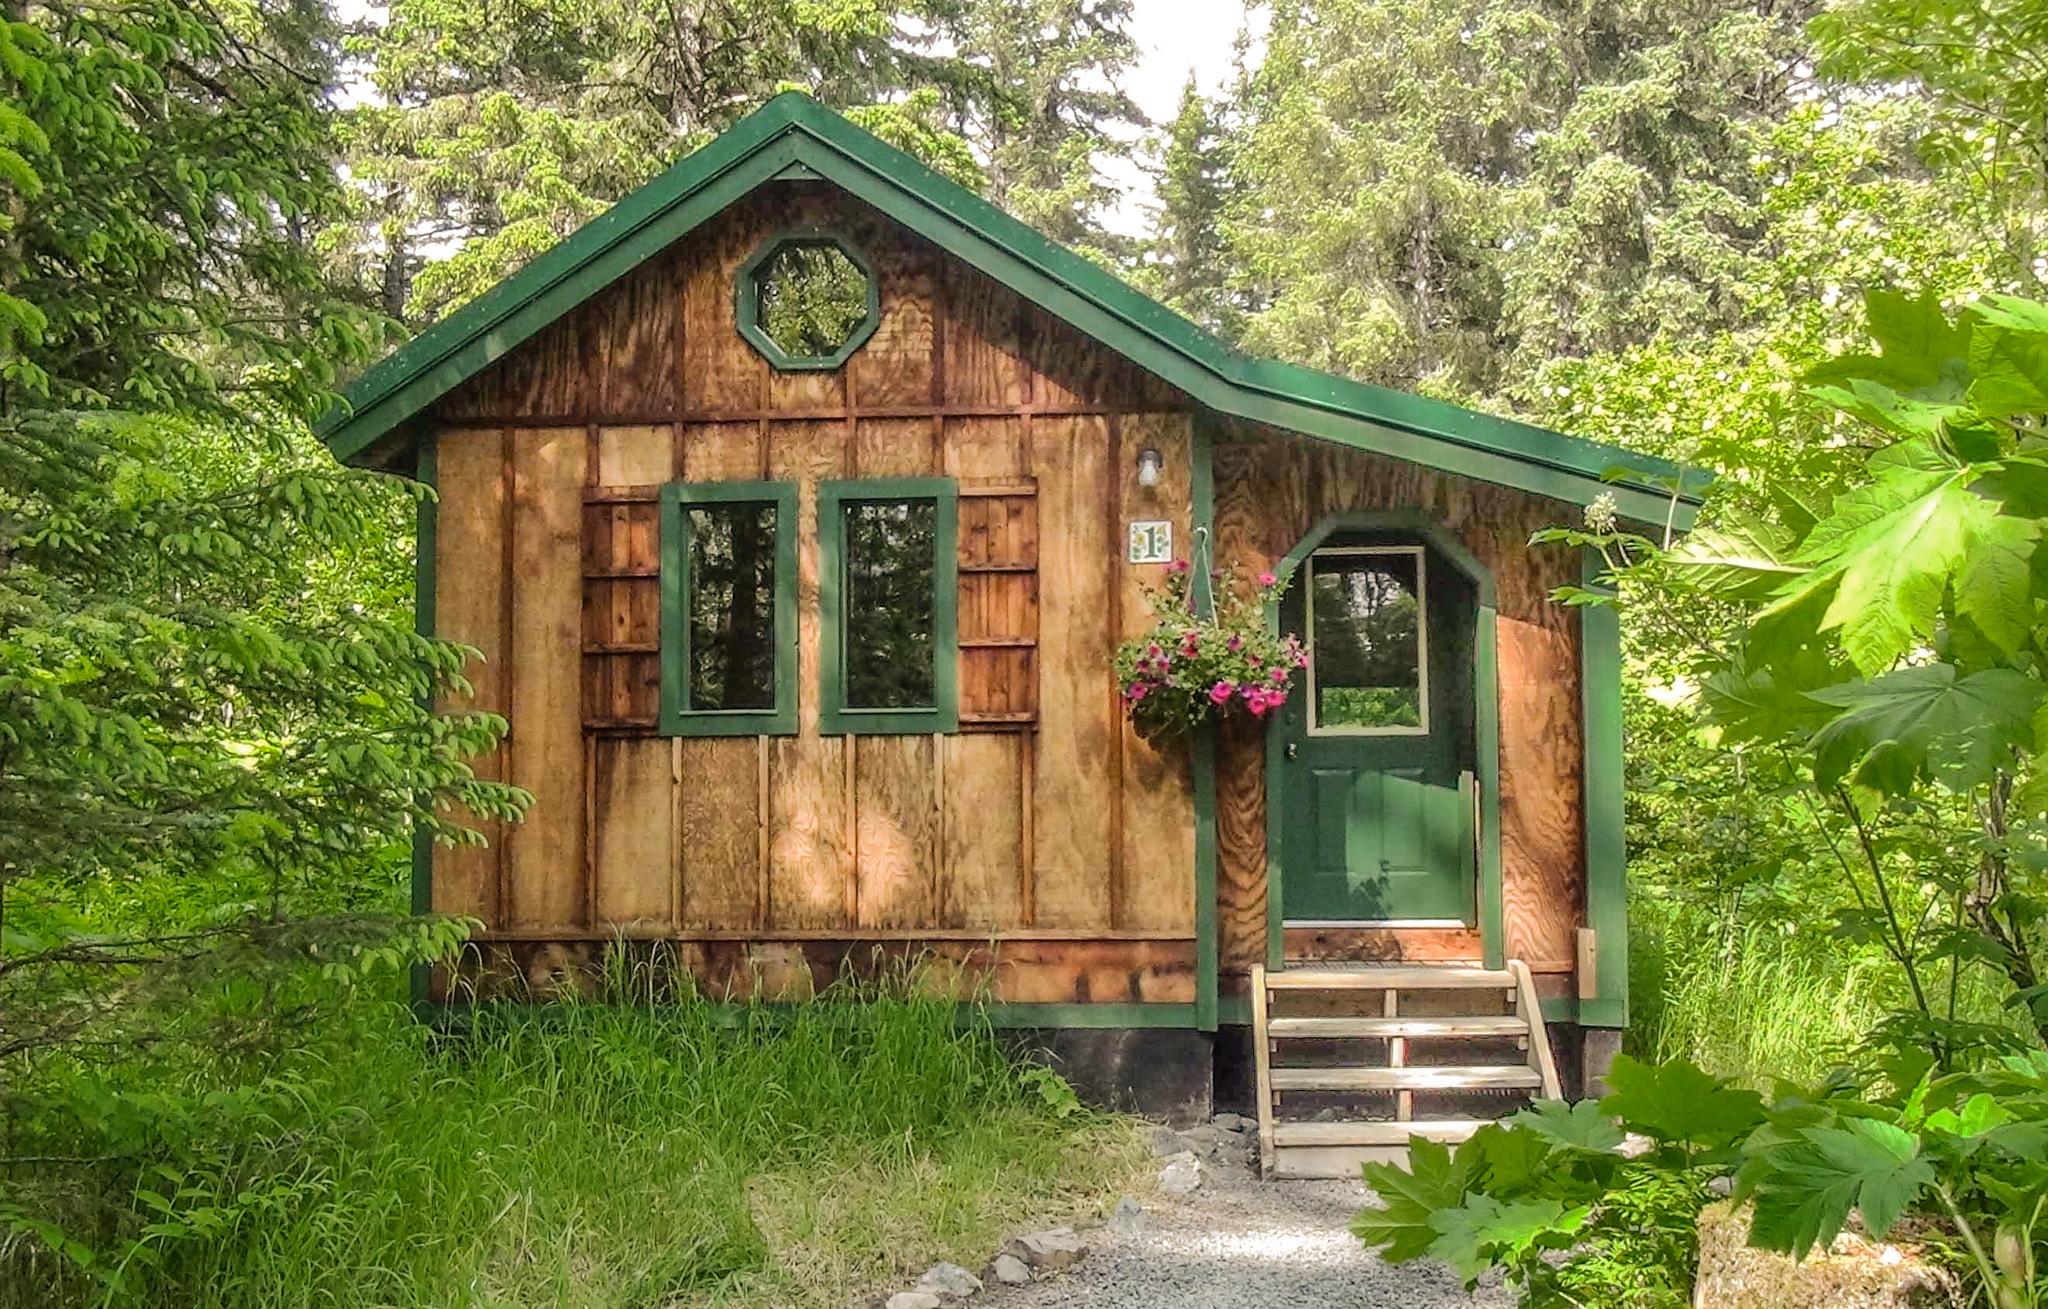 Seavey's Abode Well Cabins | Seward